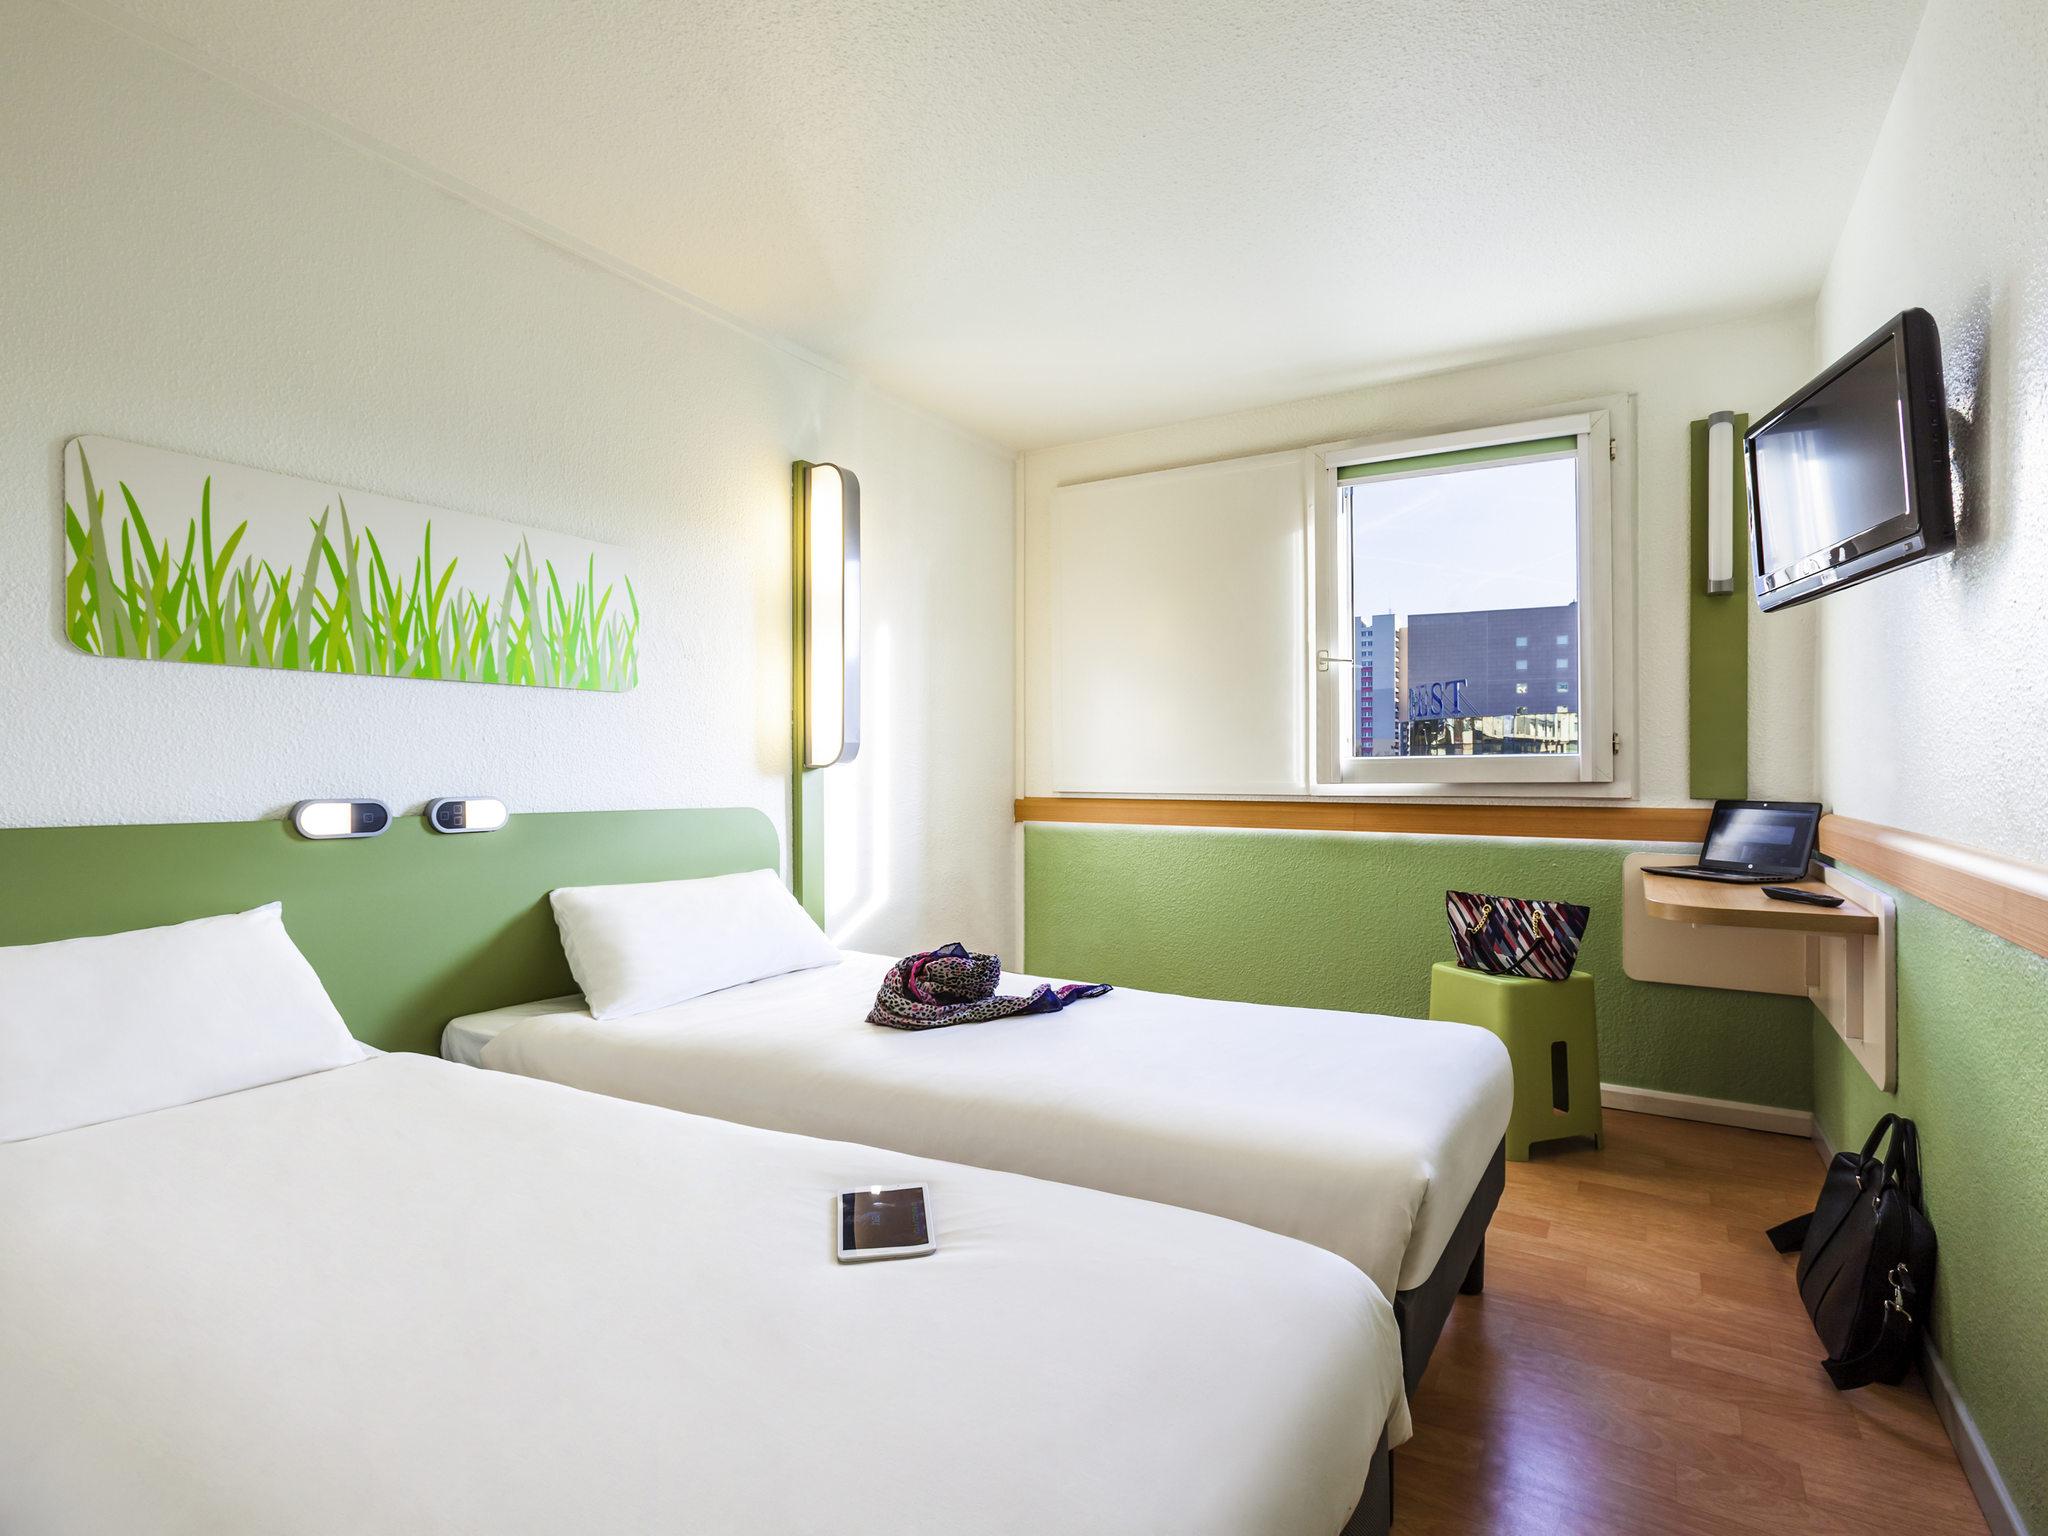 Hotel in BAGNOLET ibis bud Paris Porte de Bagnolet